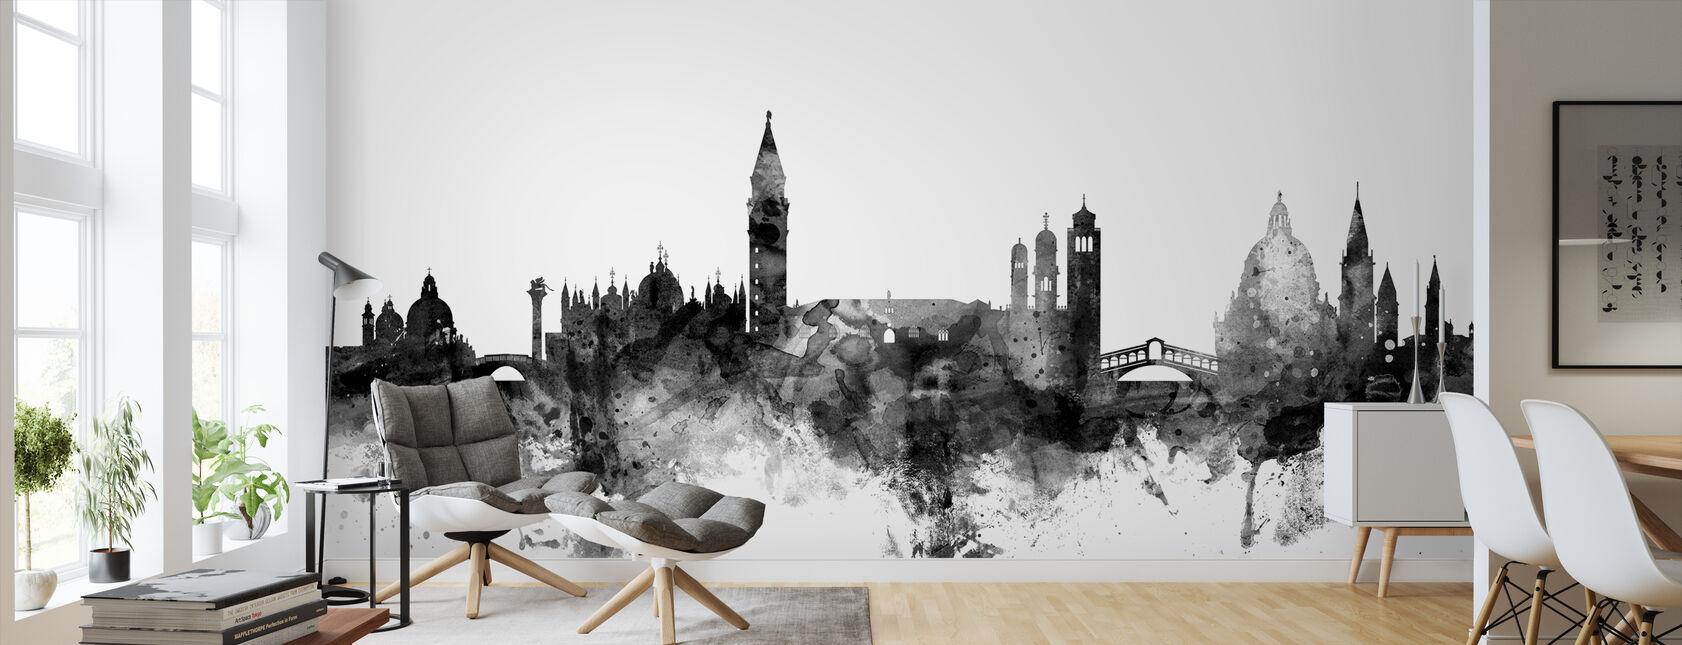 Venice Italy Skyline Black - Wallpaper - Living Room